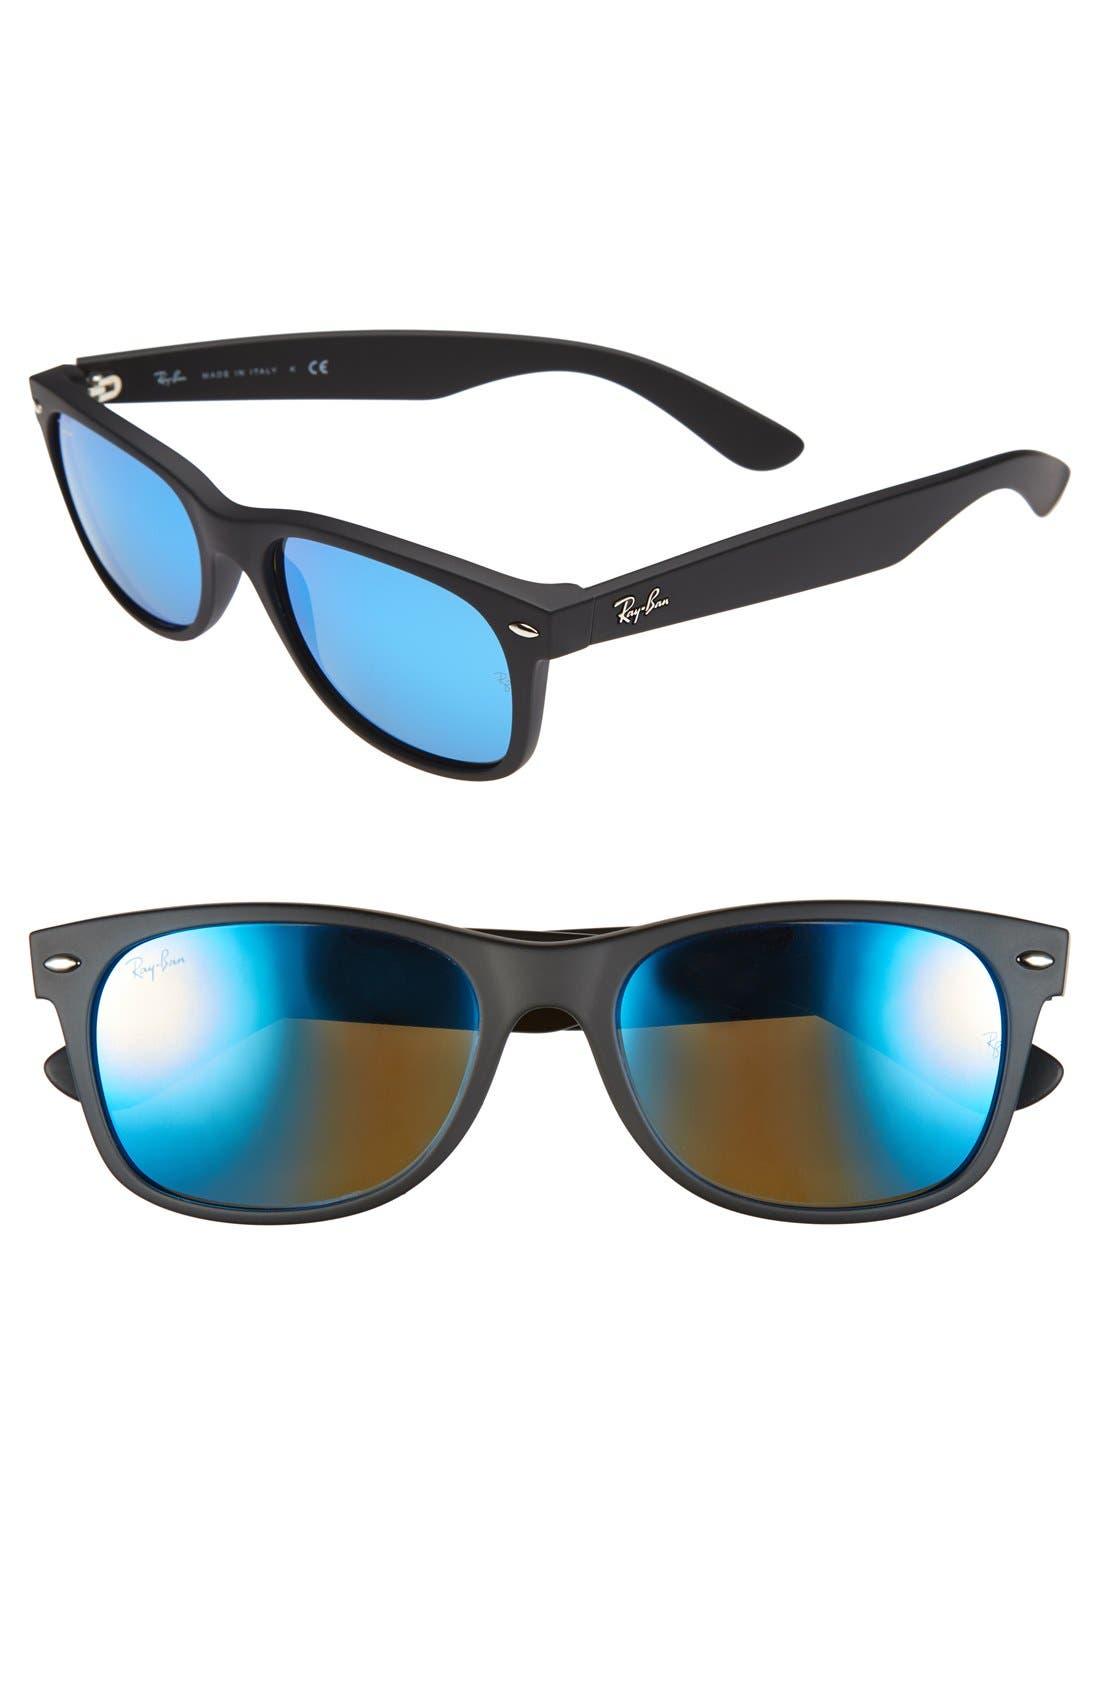 Alternate Image 1 Selected - Ray-Ban 'New Wayfarer' 55mm Sunglasses